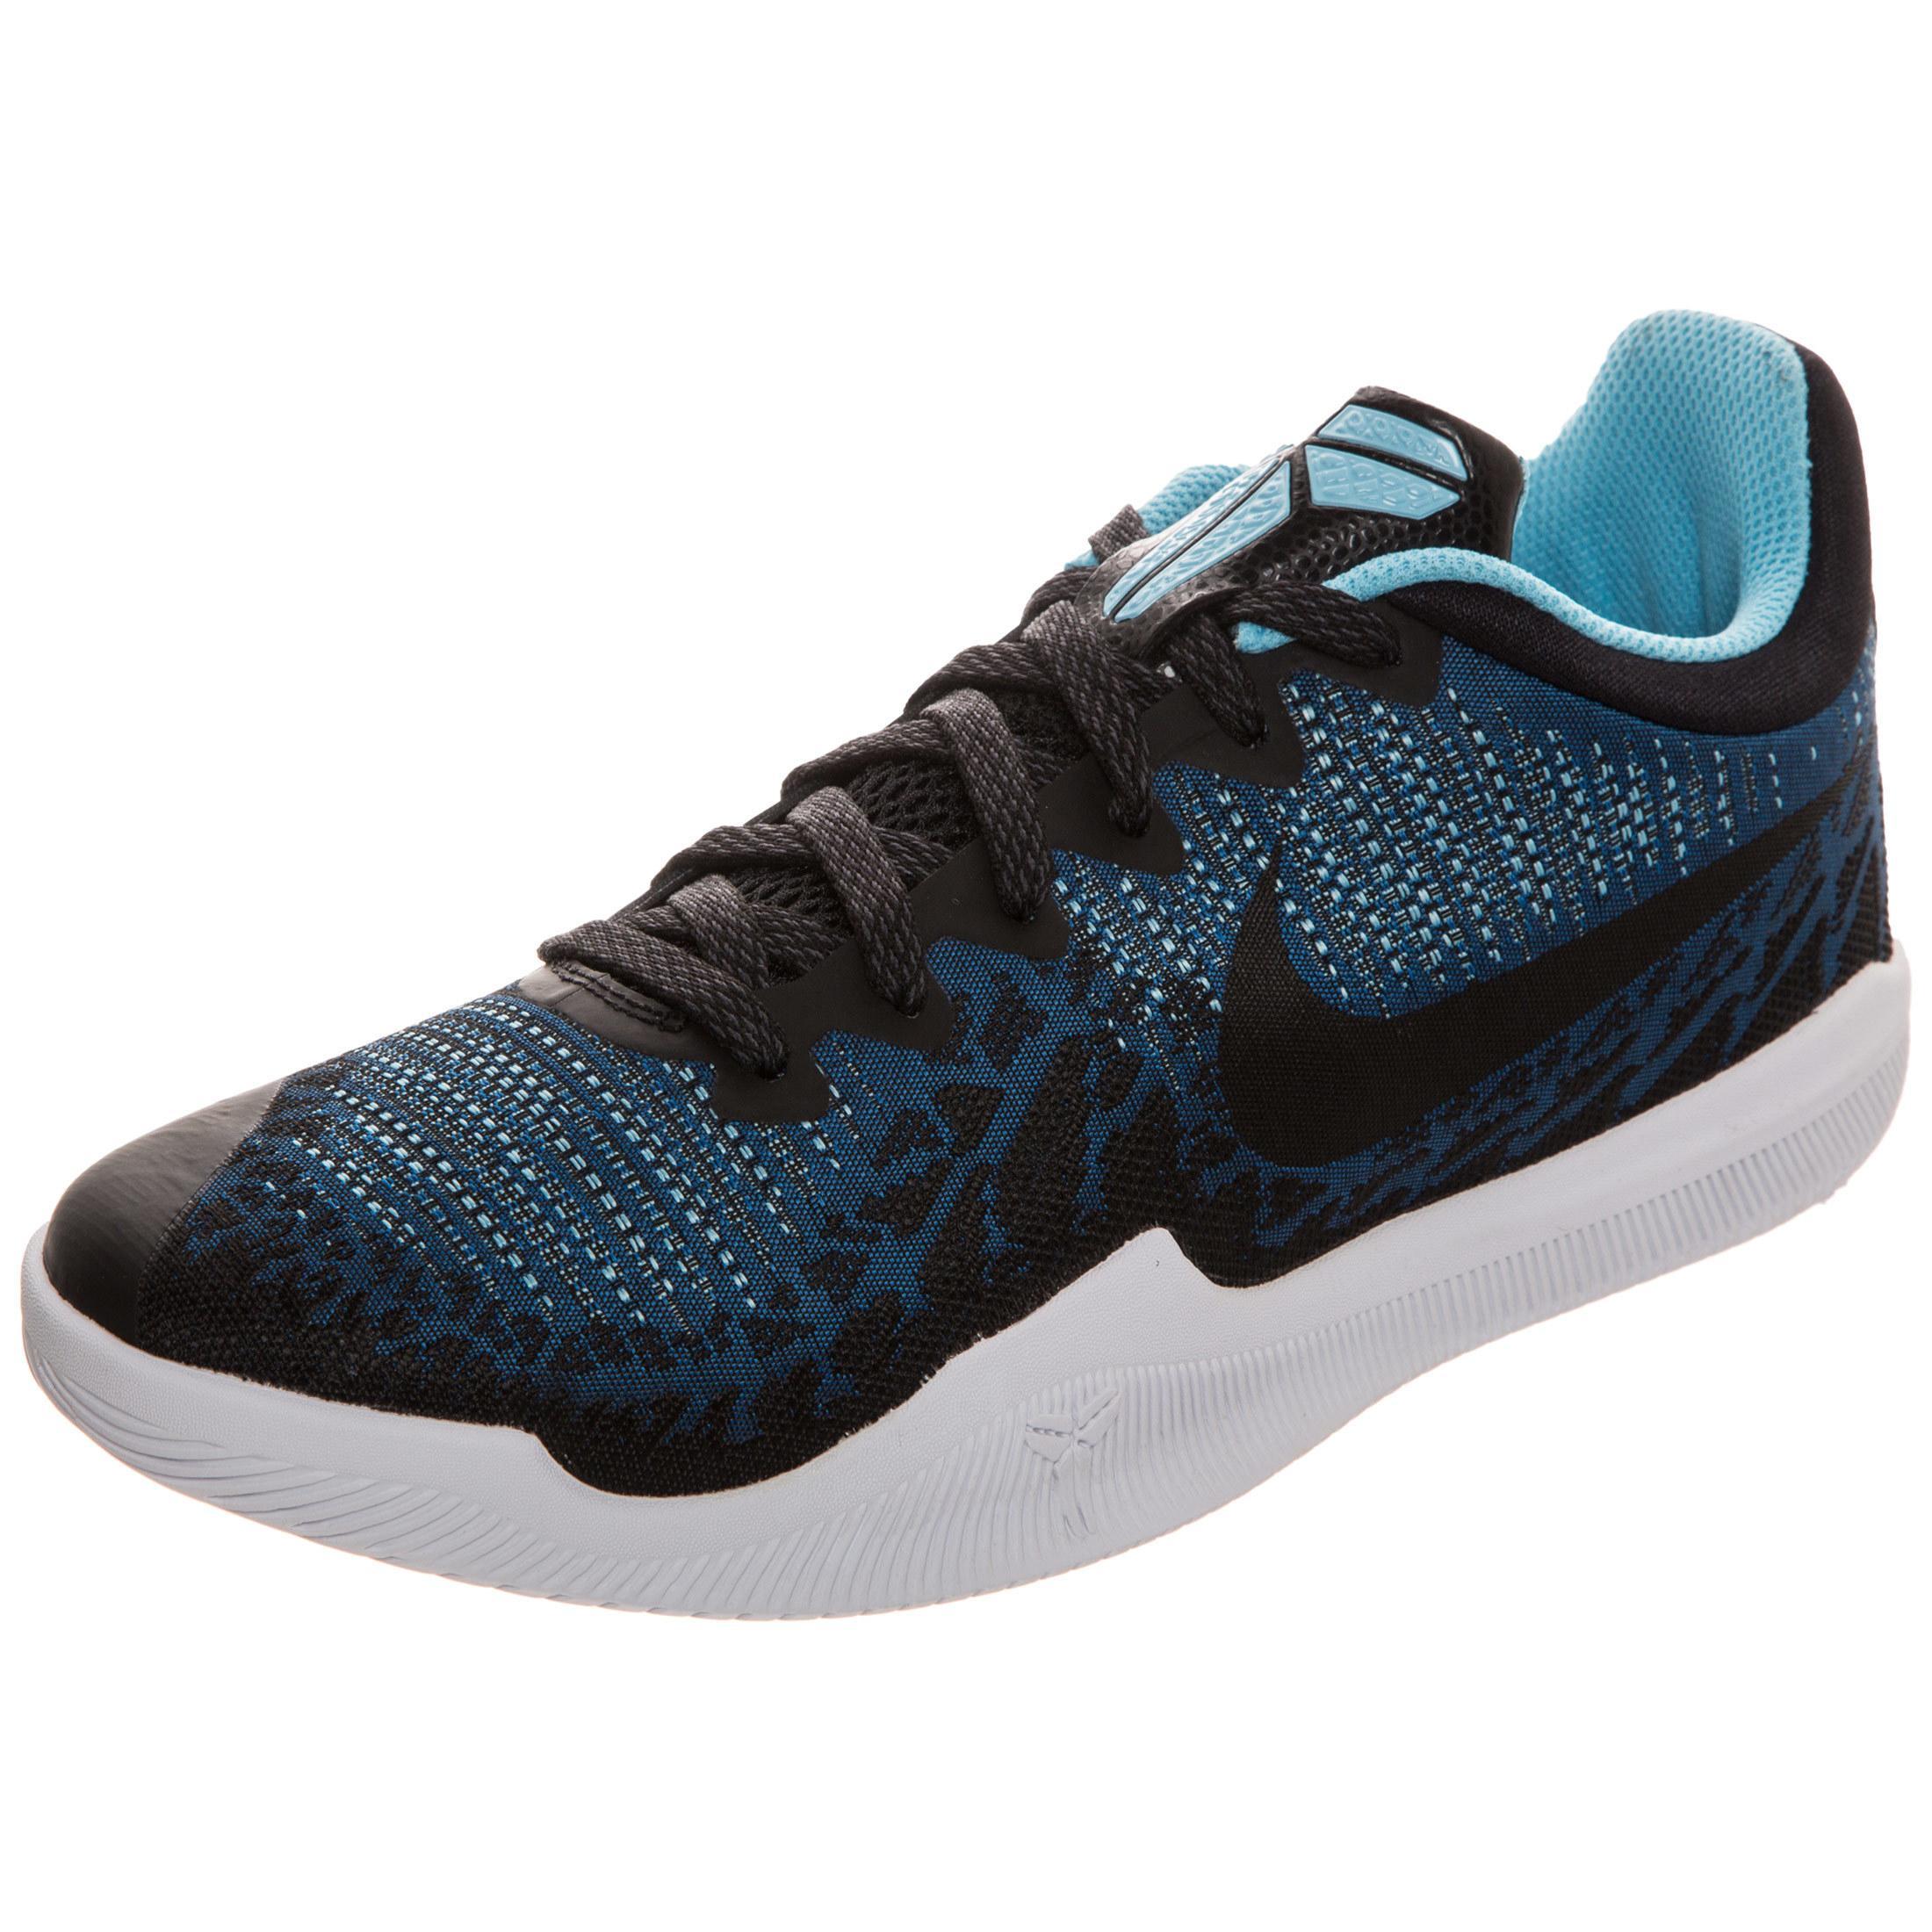 Schwarz Im Herren Blau Kobe Rage Nike Basketballschuhe Mamba